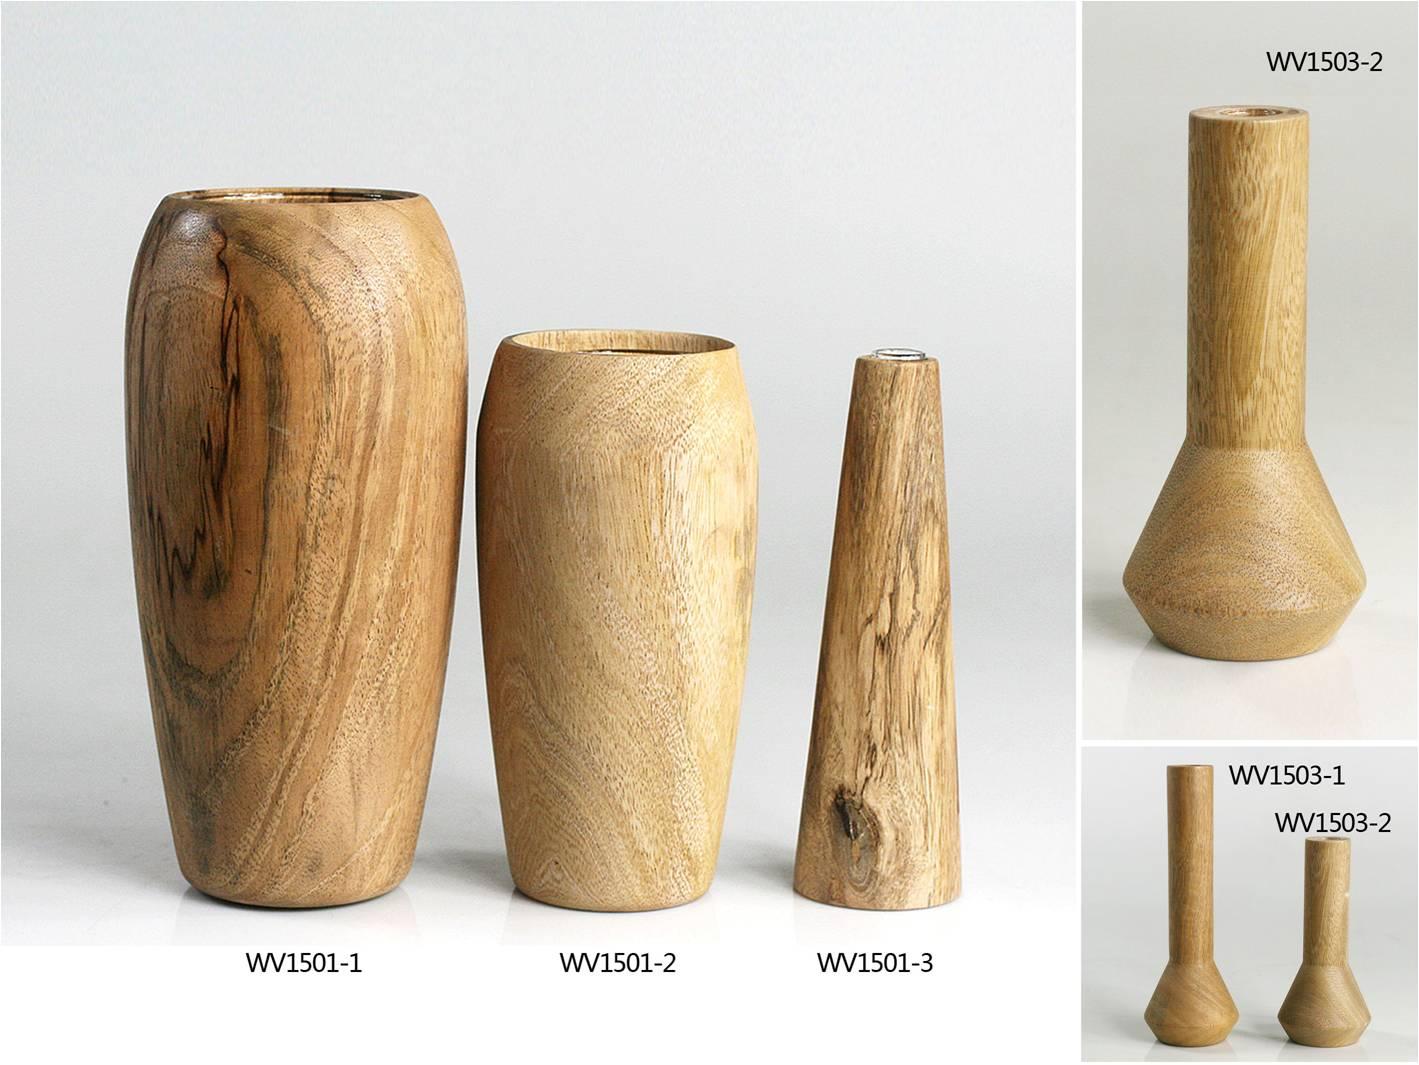 木艺产品 Wooden Products-13